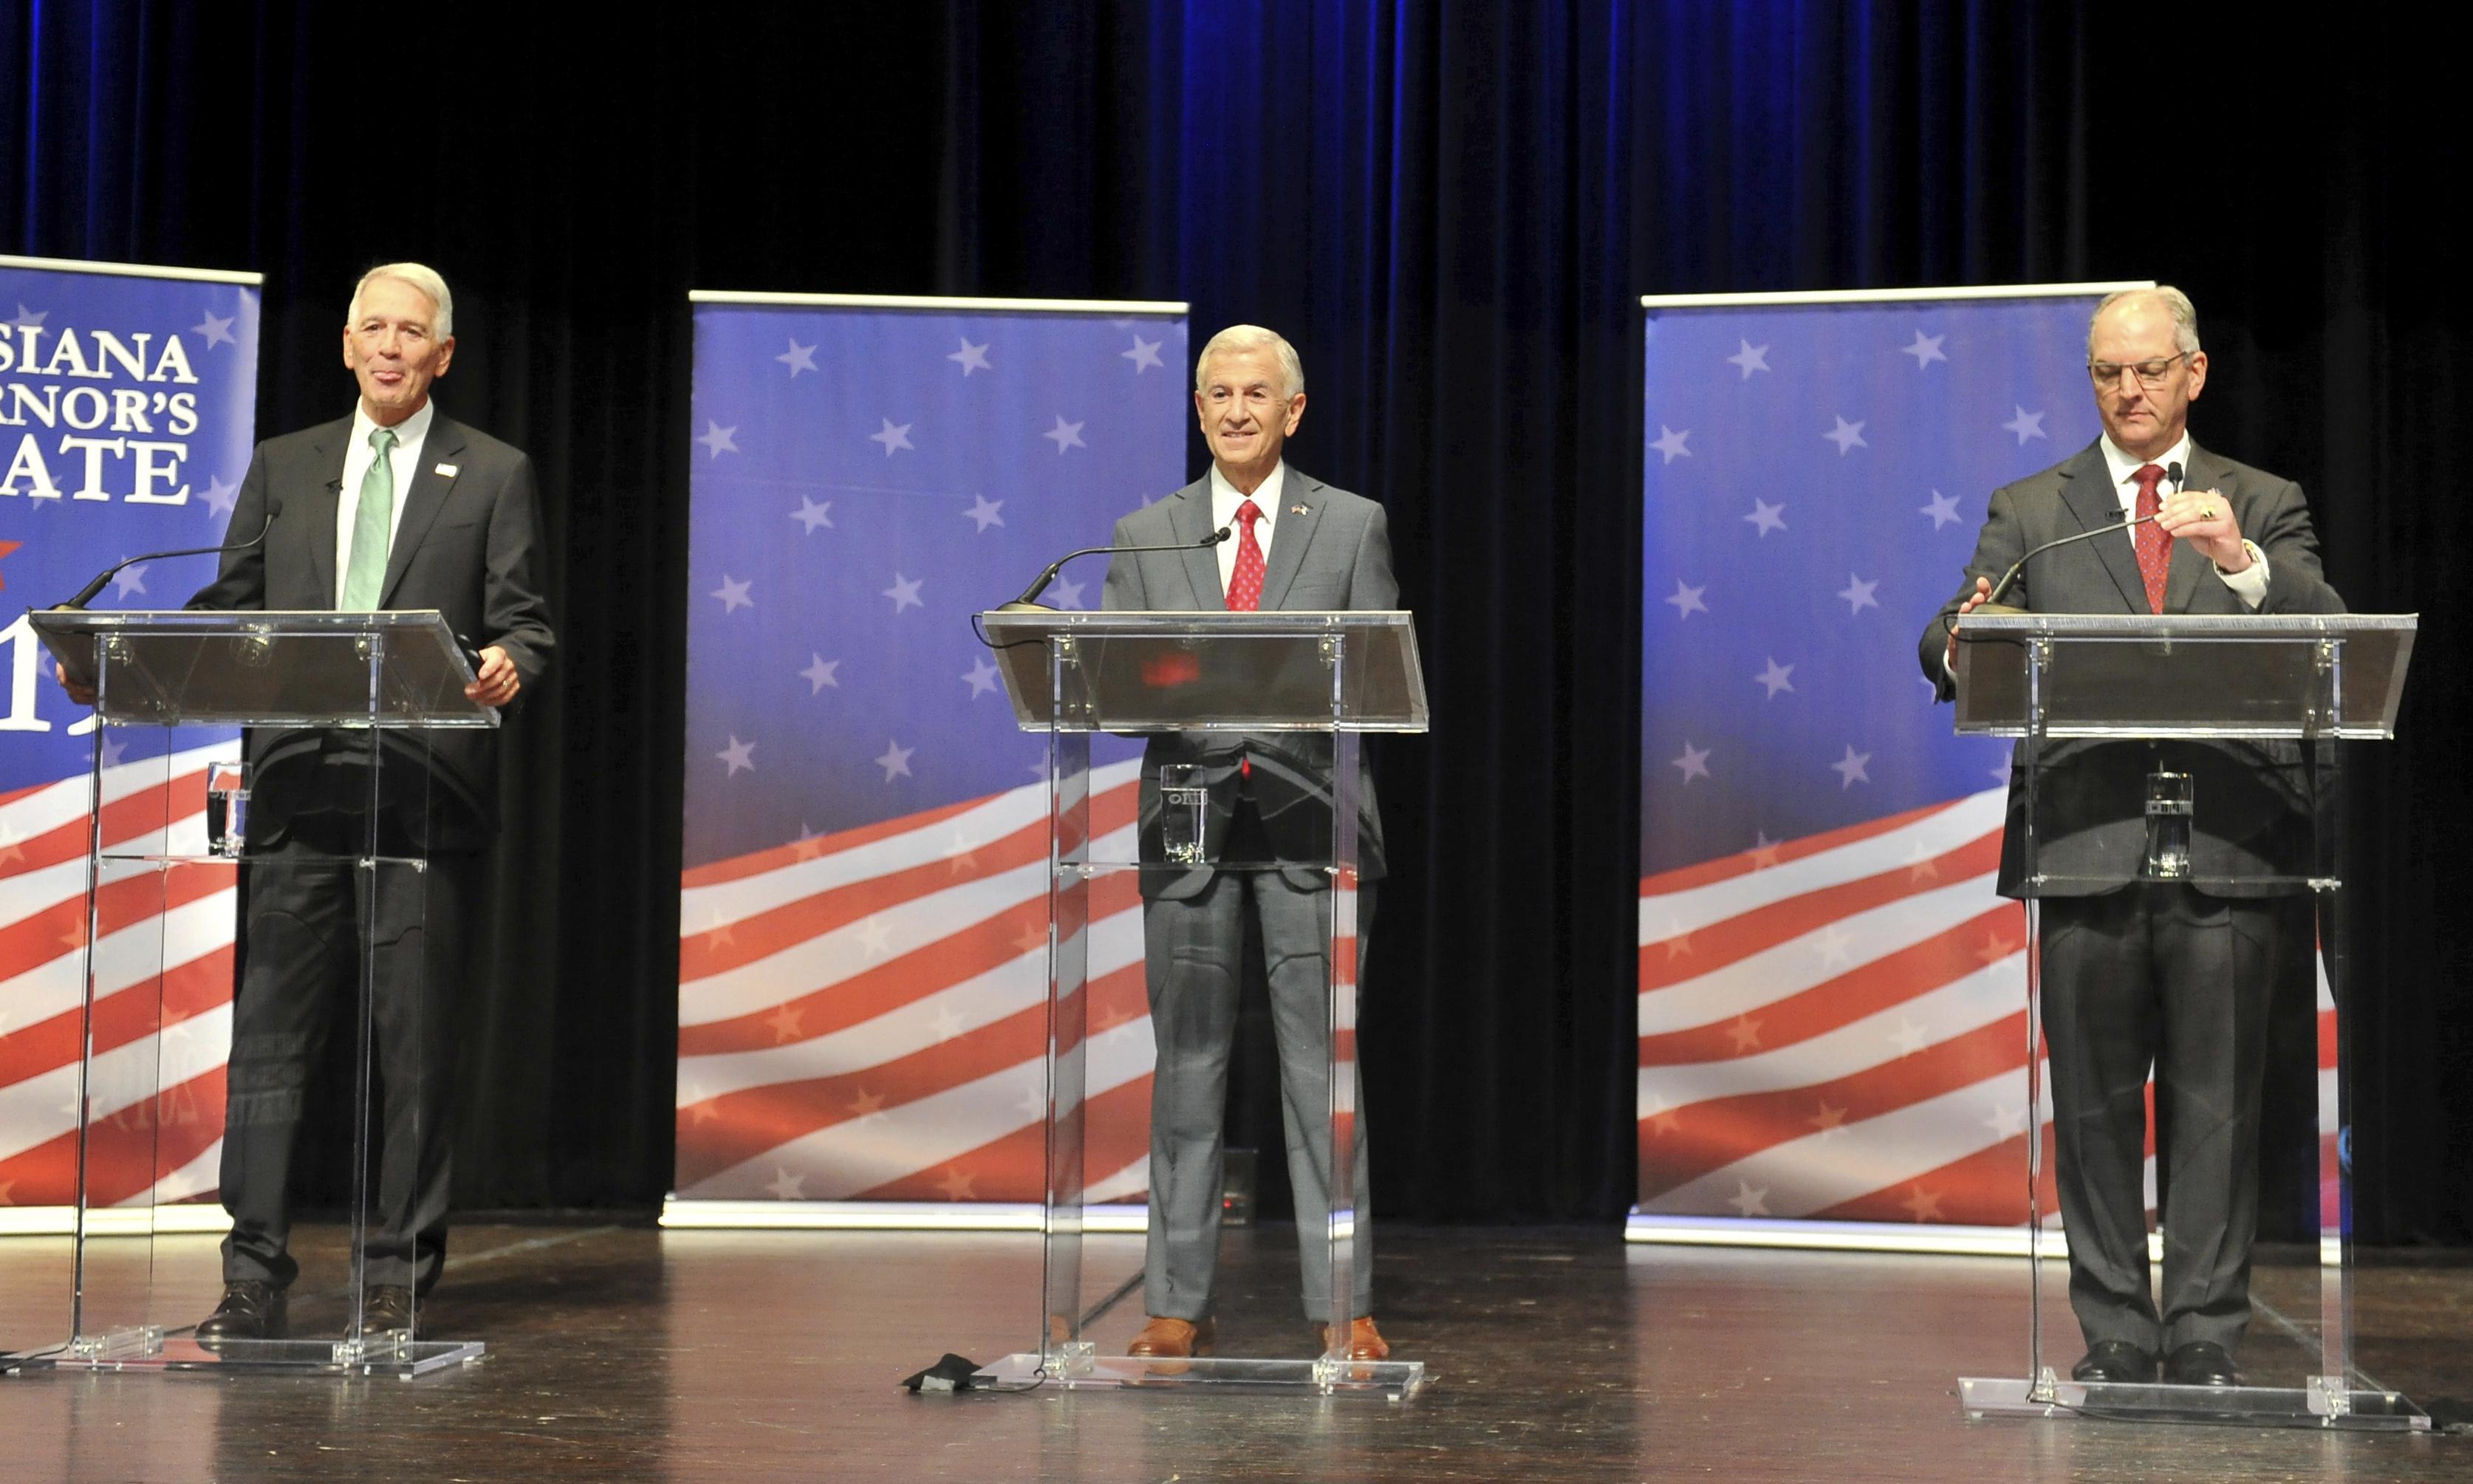 Louisiana's Democratic governor battles to avoid runoff election